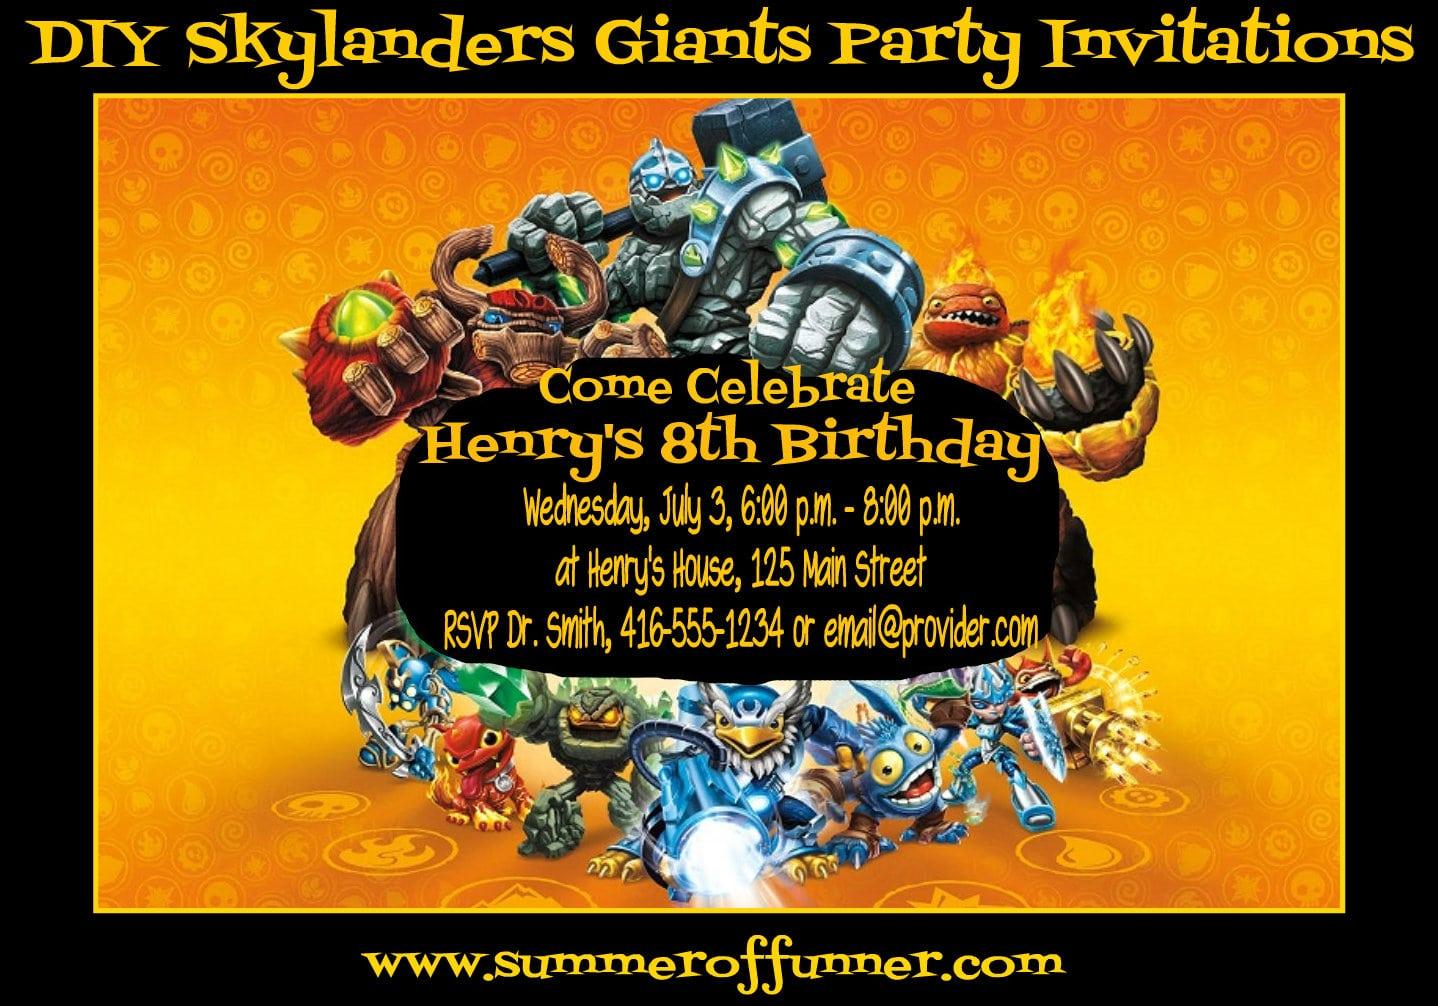 17 Best Images About Jack's Skylander's Party On Pinterest